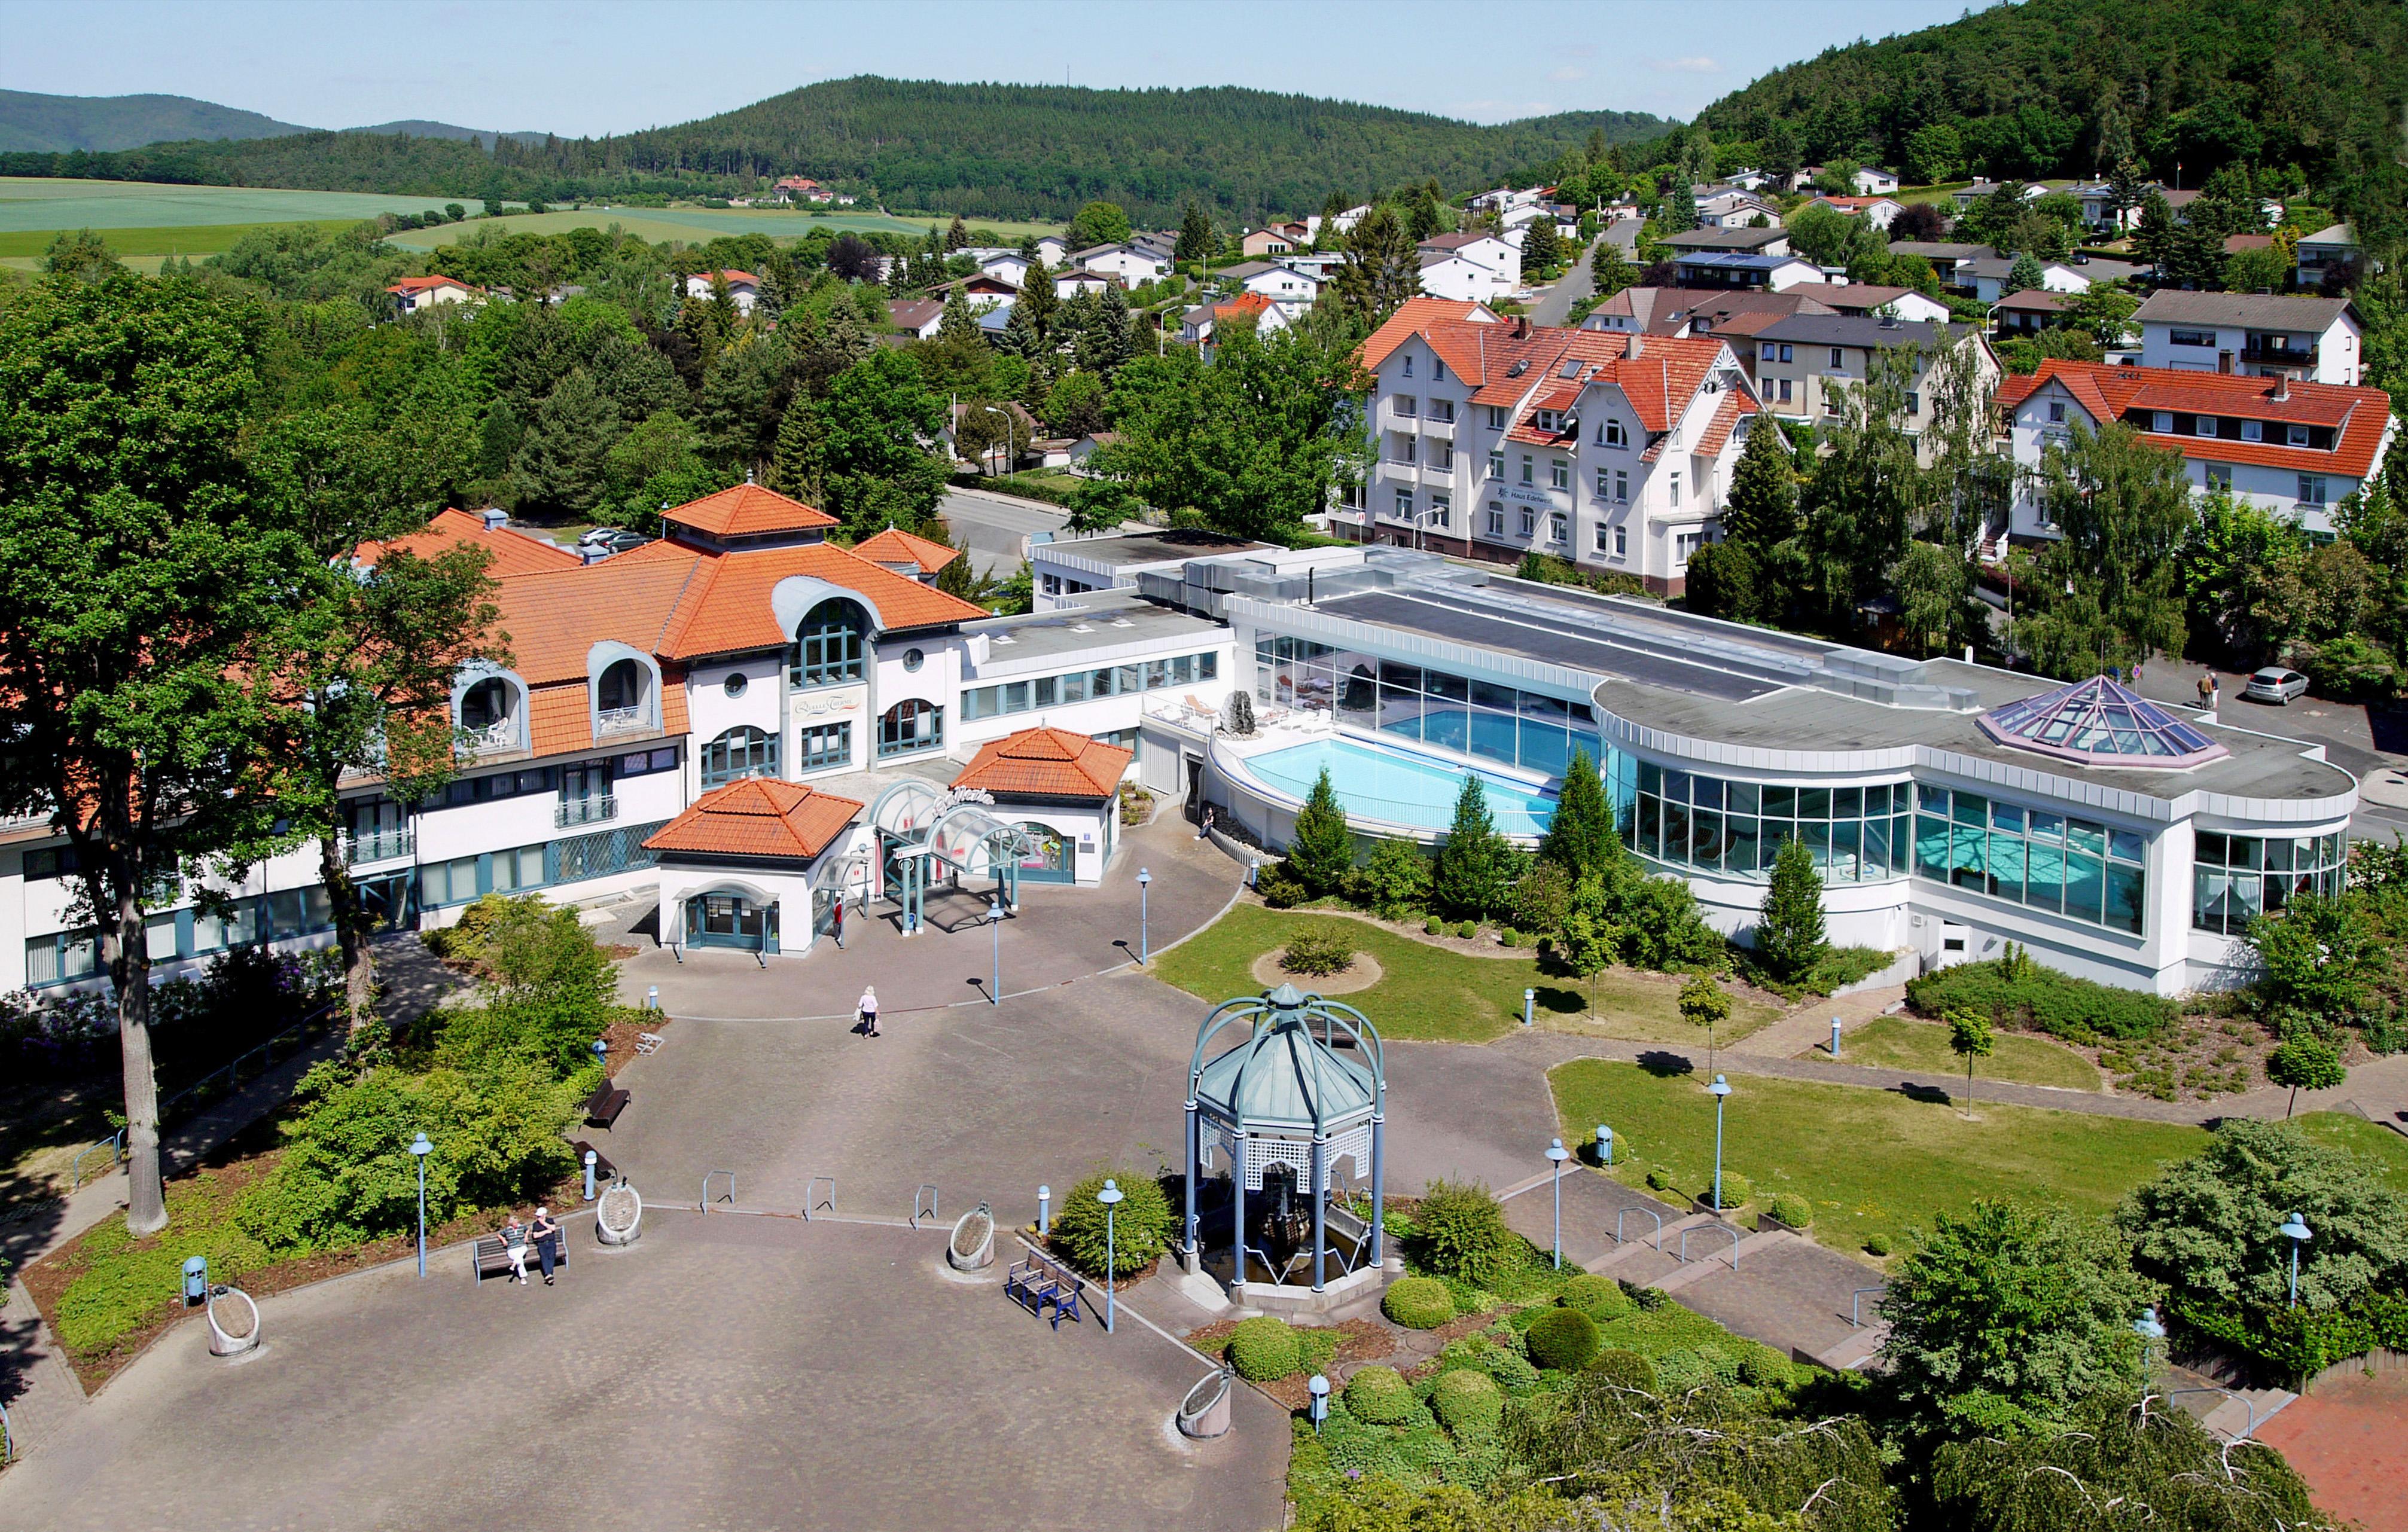 Göbel's Hotel AquaVita